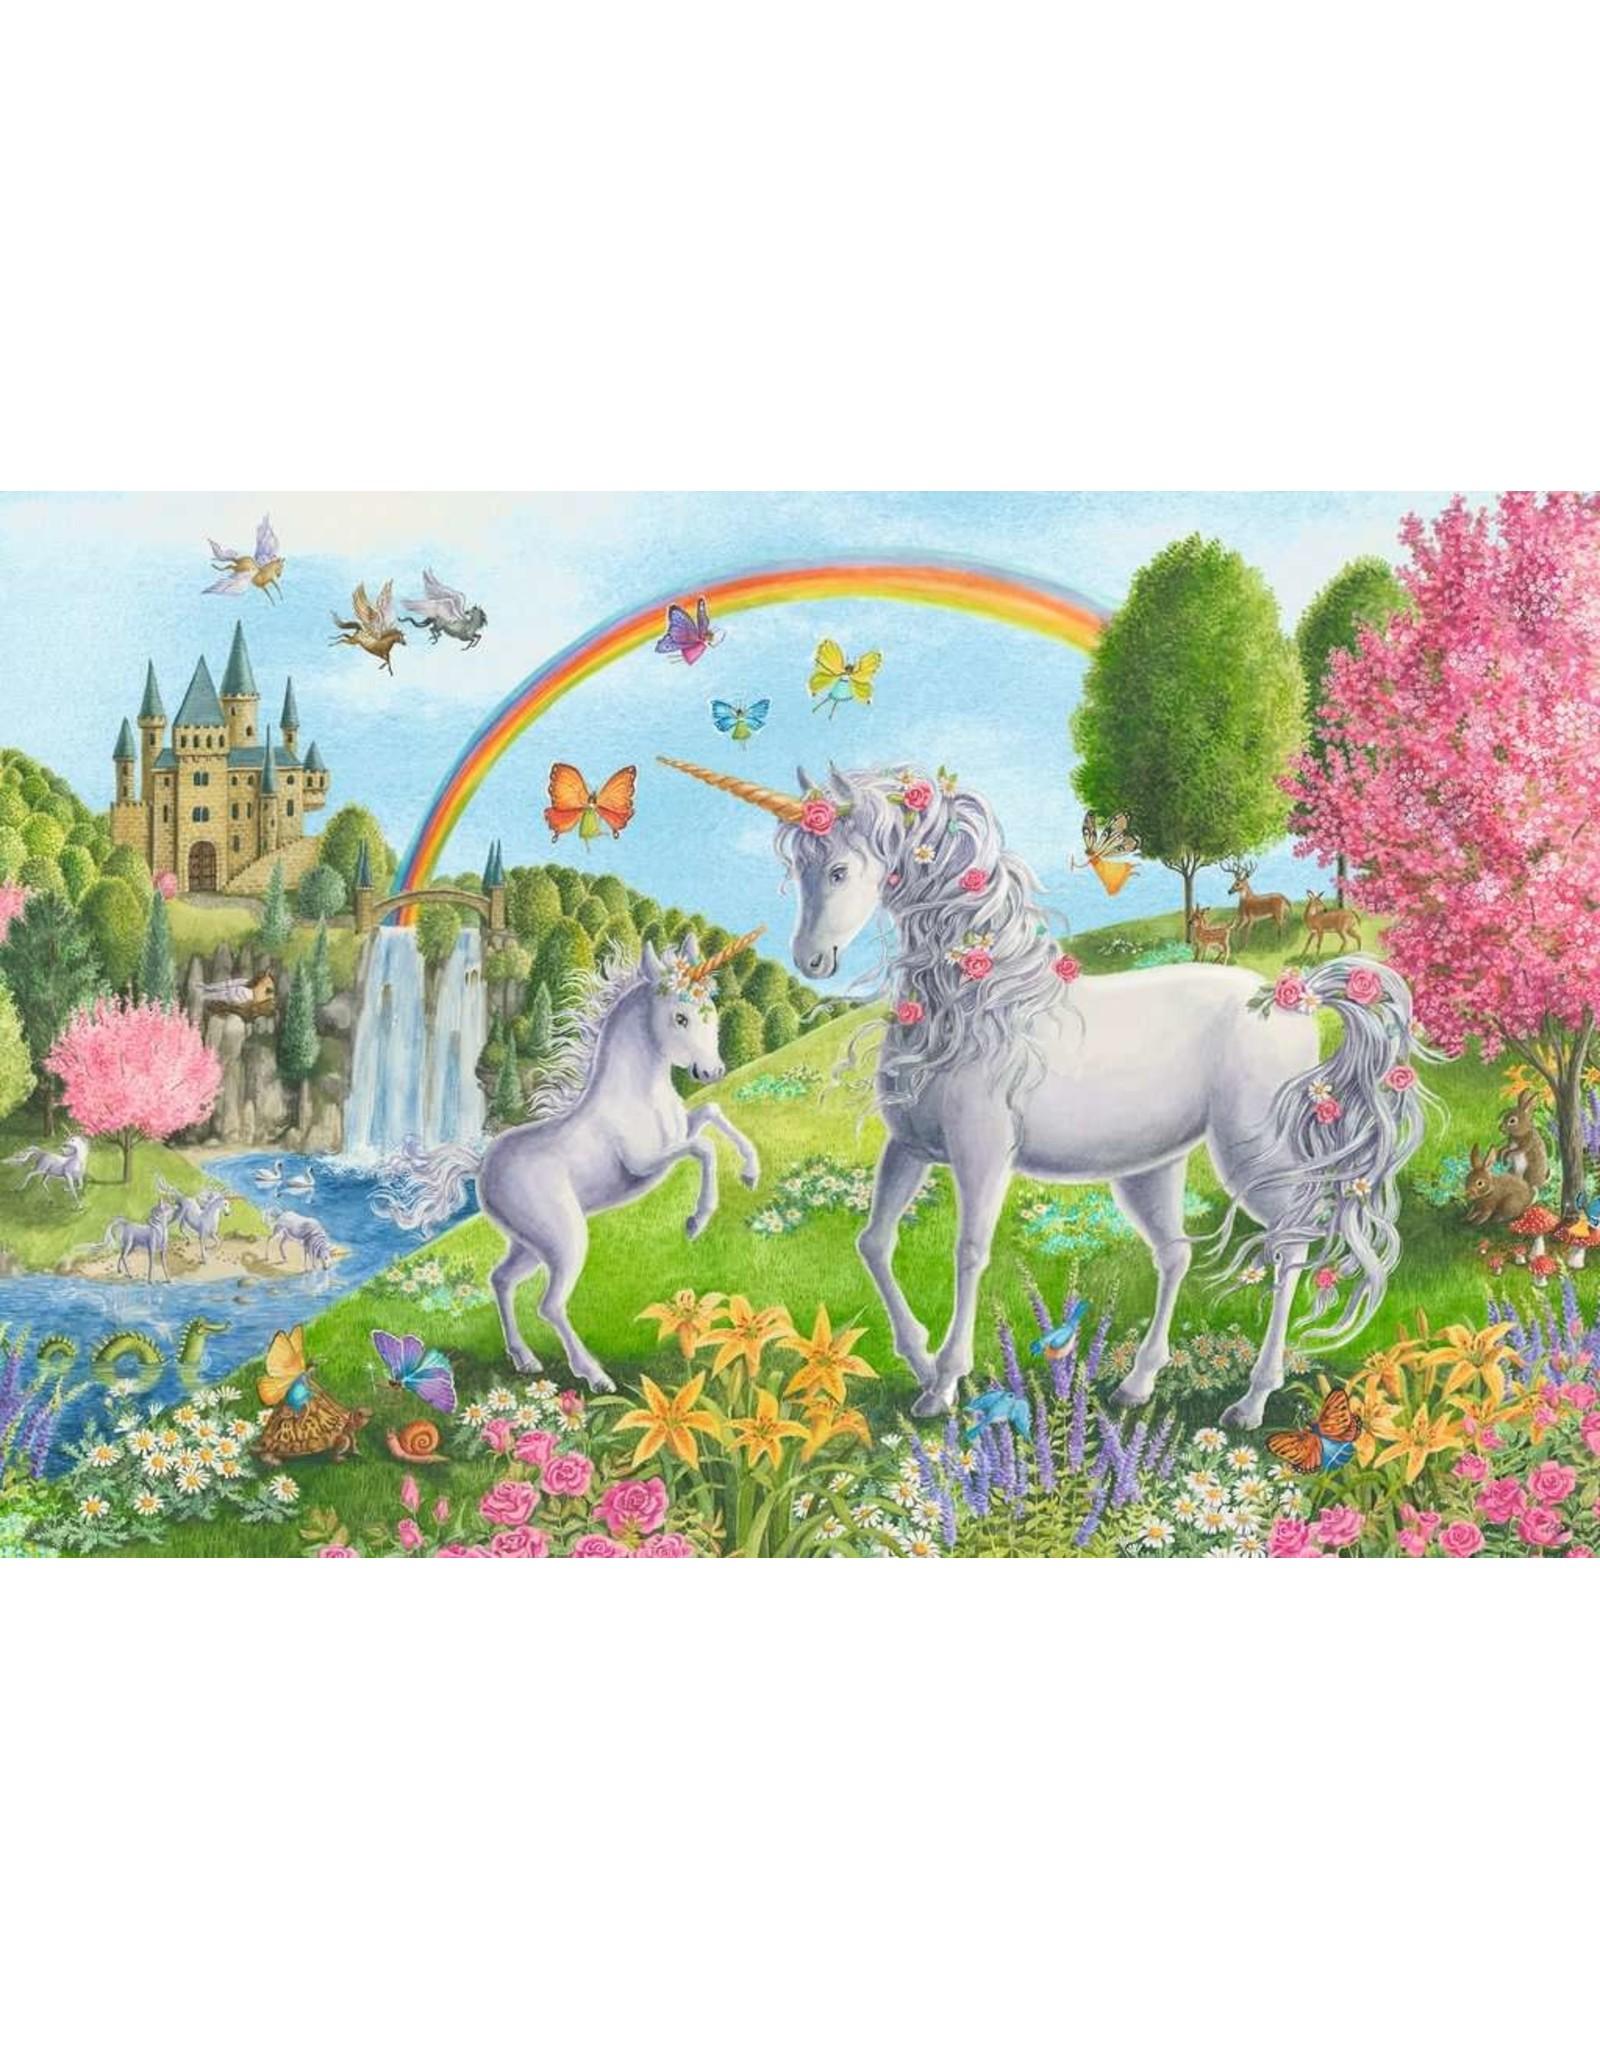 Ravensburger 24 pcs. Prancing Unicorns Floor Puzzle